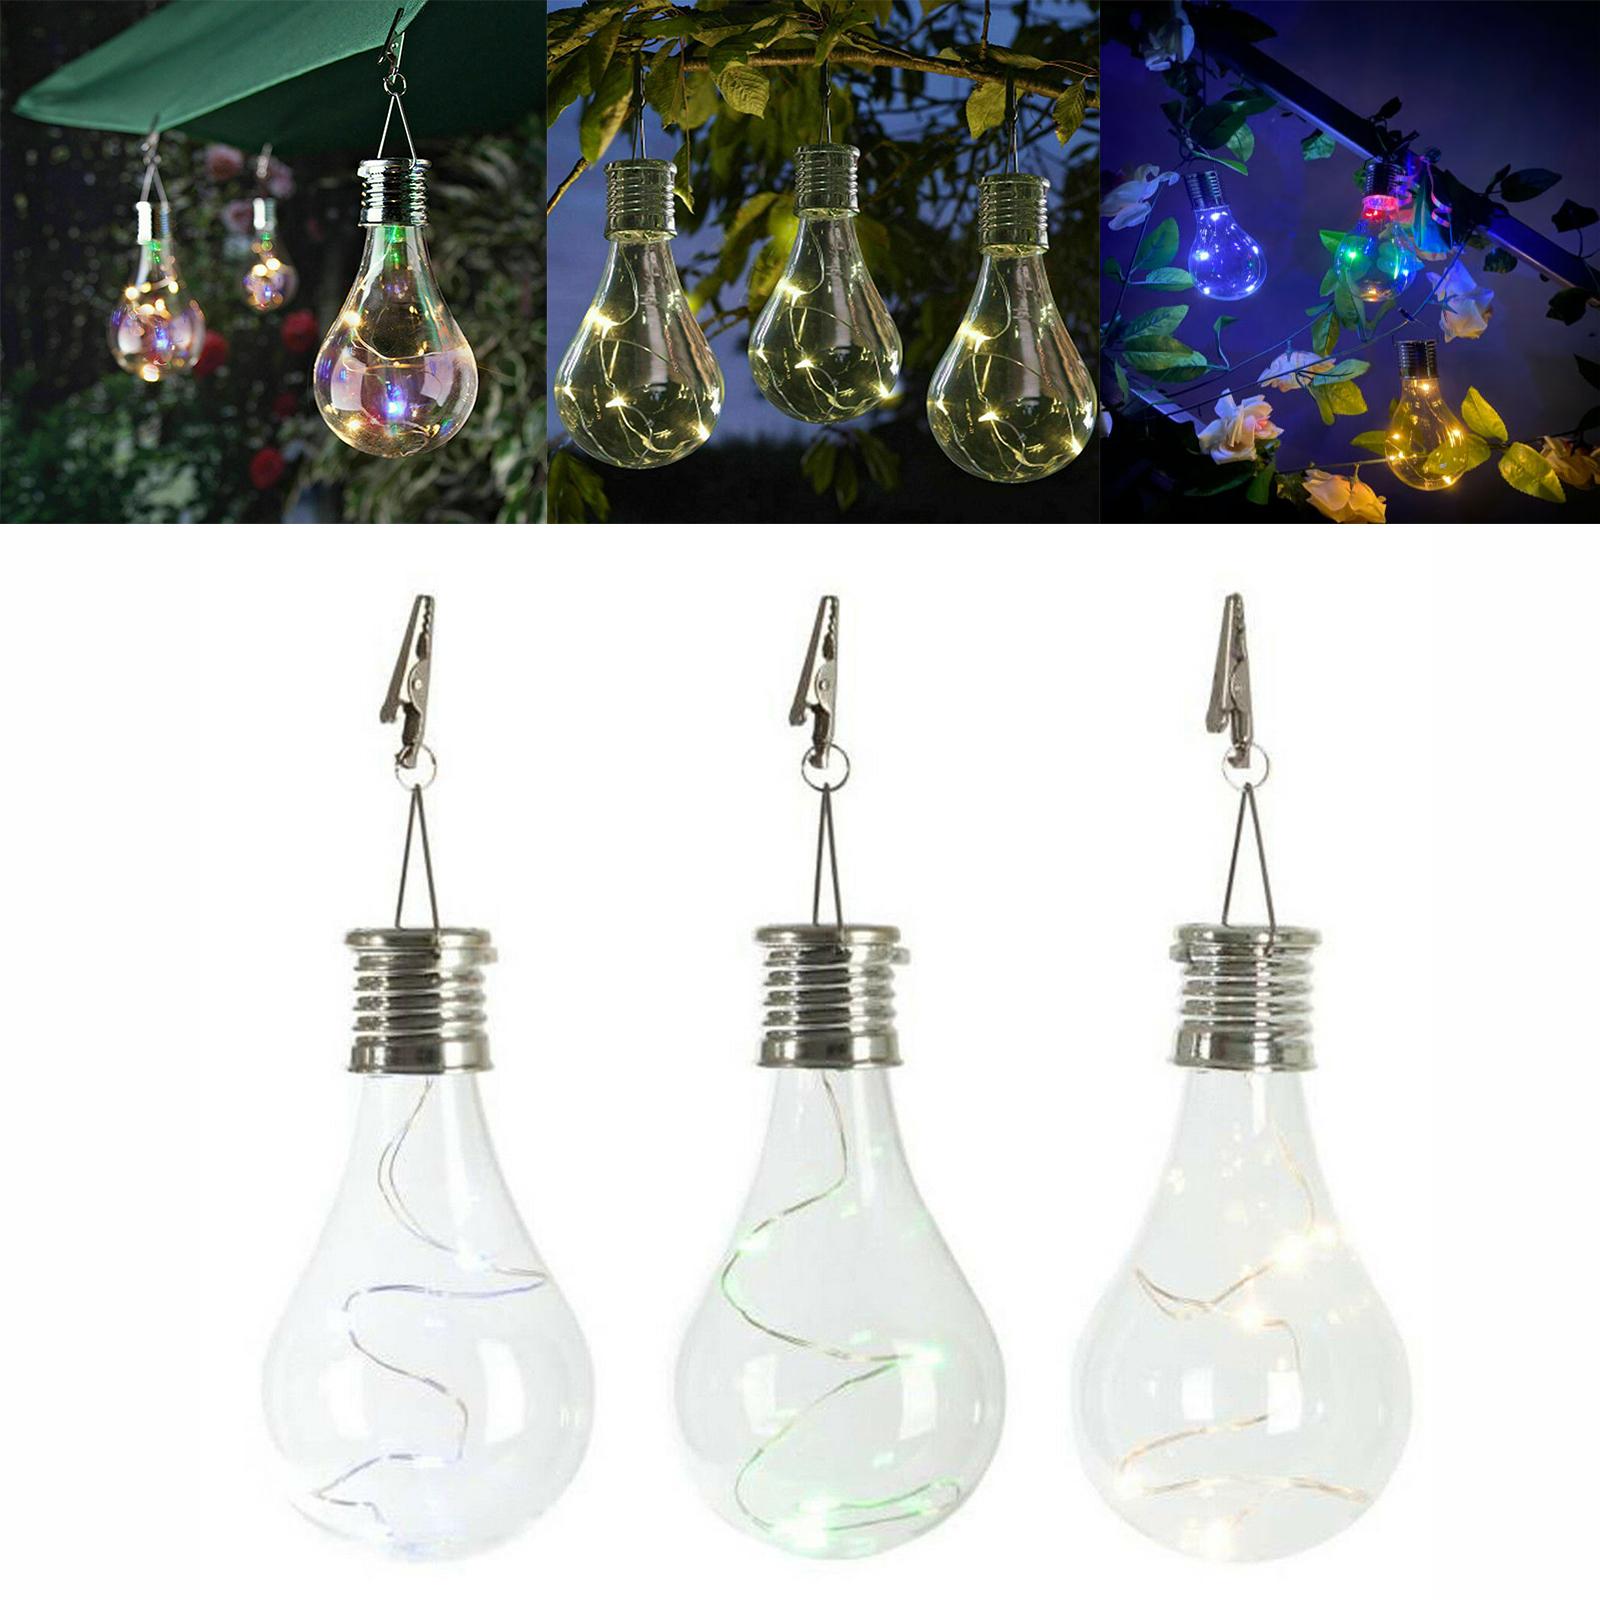 Waterproof Solar Lights Outdoor Garden Decor Camping Led Hanging Lights Lamp Ss Ebay